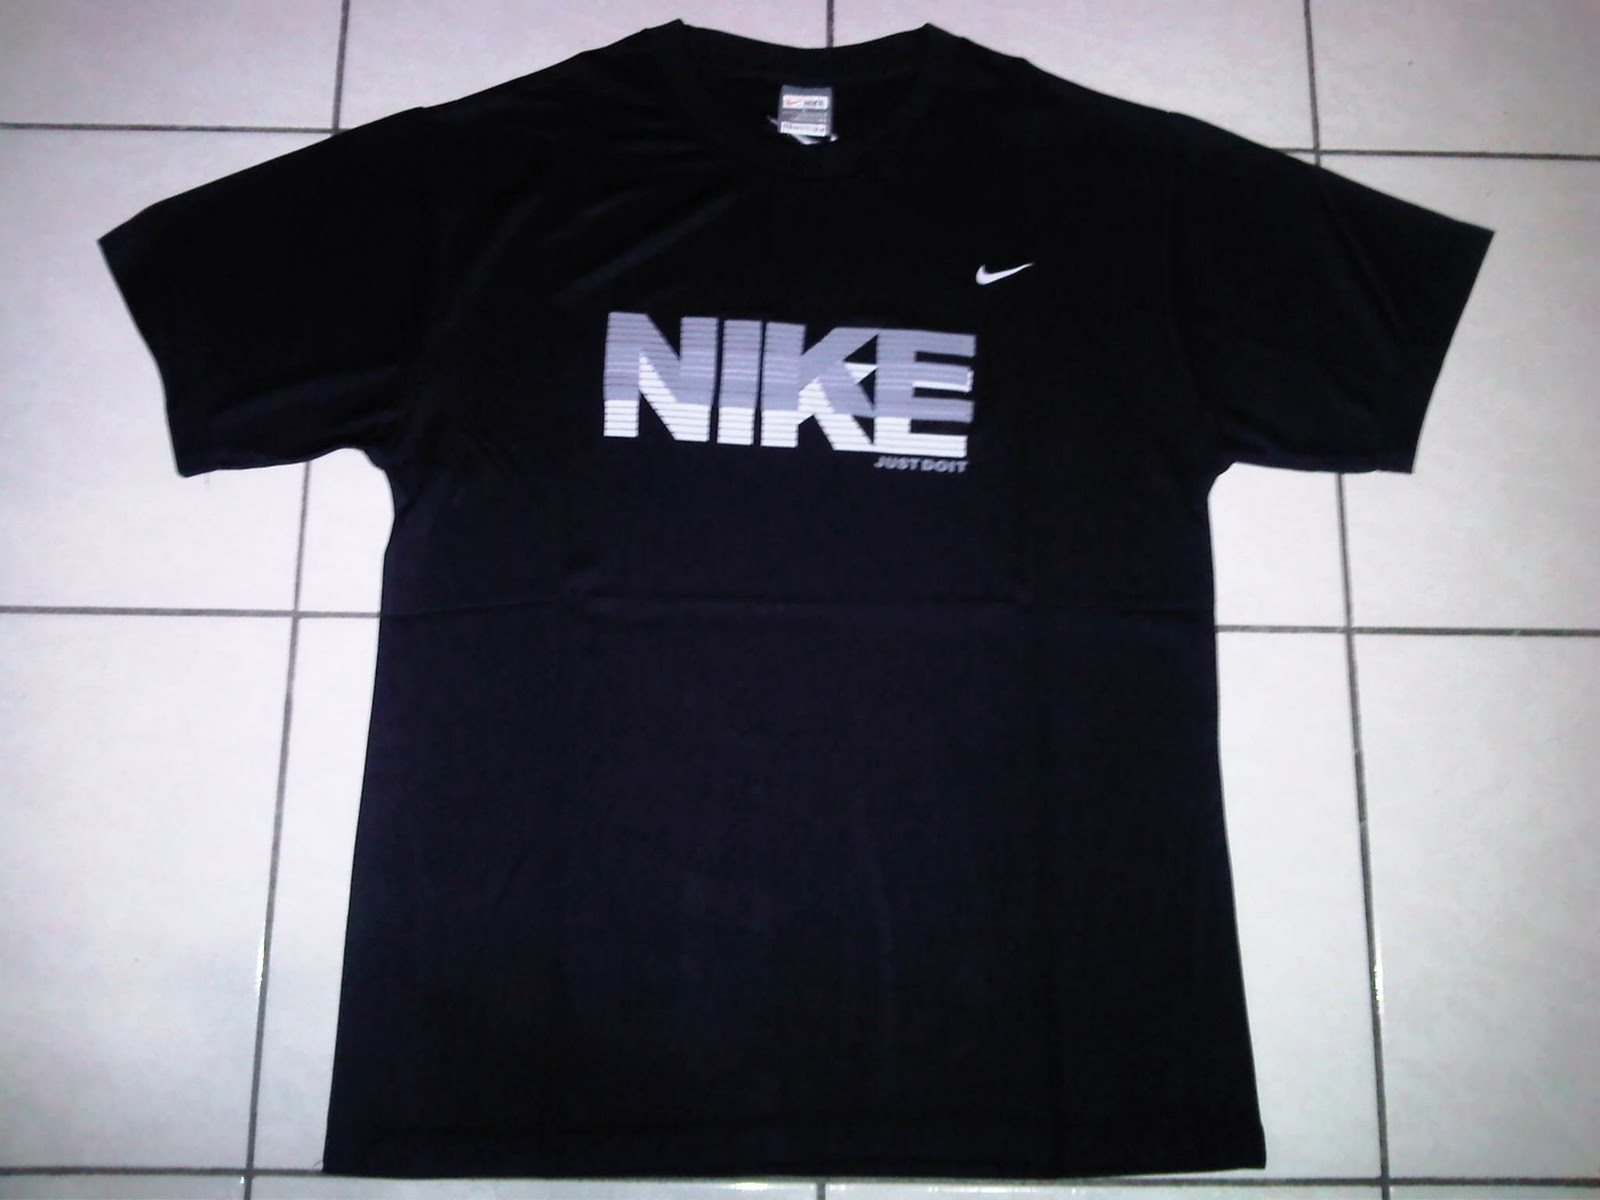 6e2feaadba53 Nike Tee Shirt Sayings